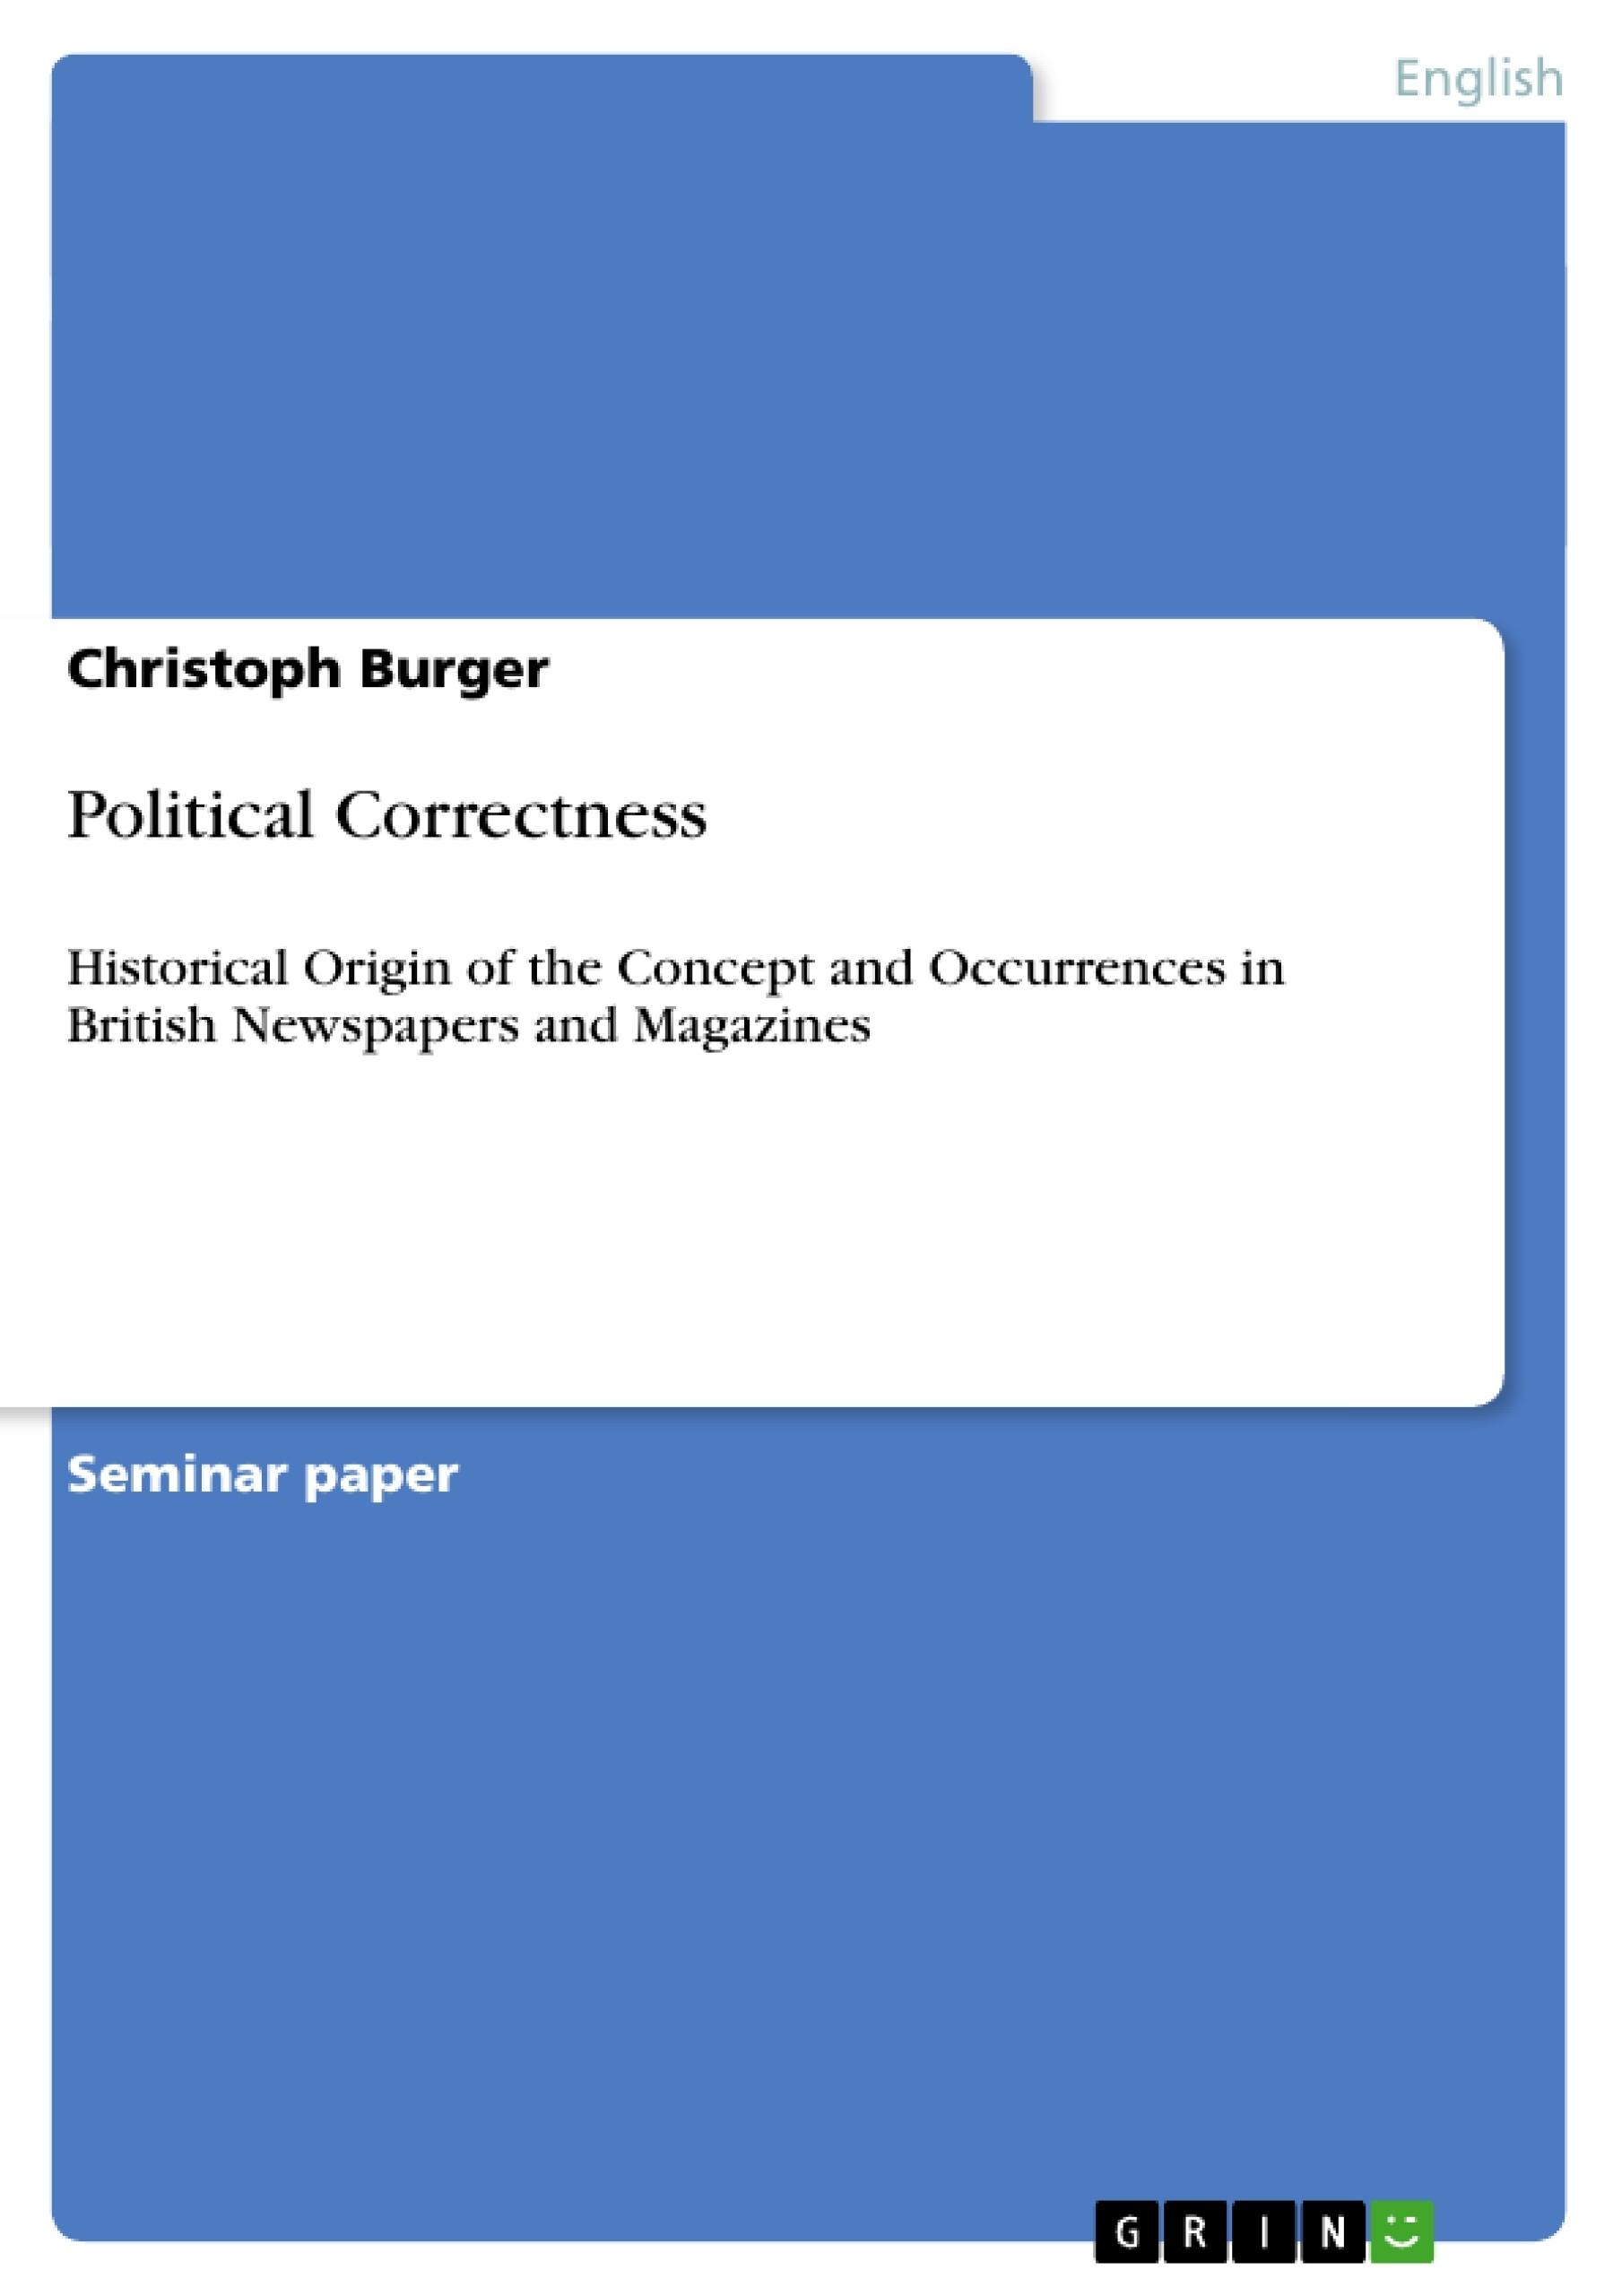 Title: Political Correctness